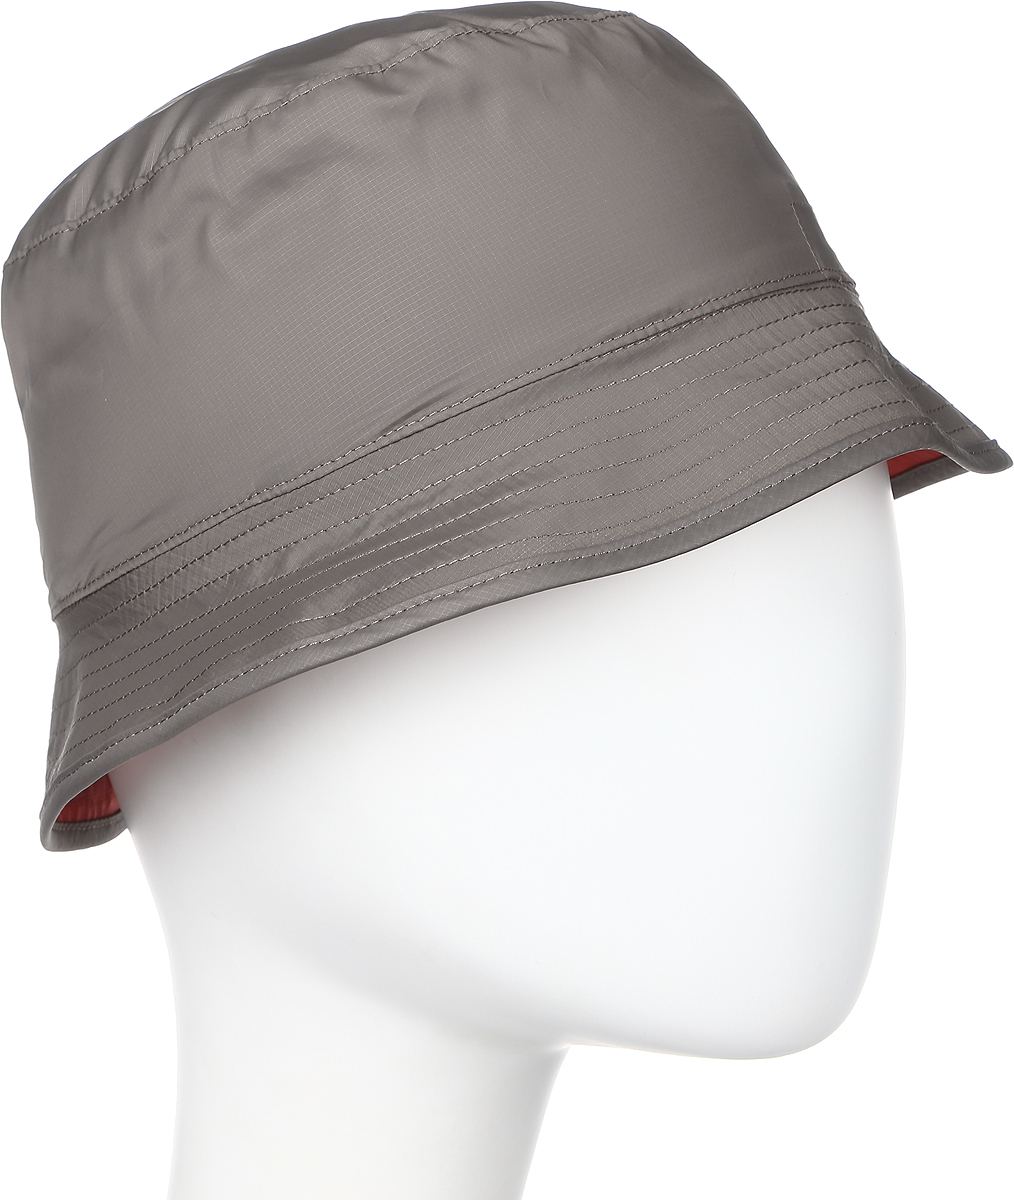 Панама The North Face Sun Stash Hat, цвет: тауп. T0CGZ0RDQ. Размер S/M (56/57) бейсболка the north face mudder trucker hat цвет хаки бежевый t0cgw2scg размер универсальный